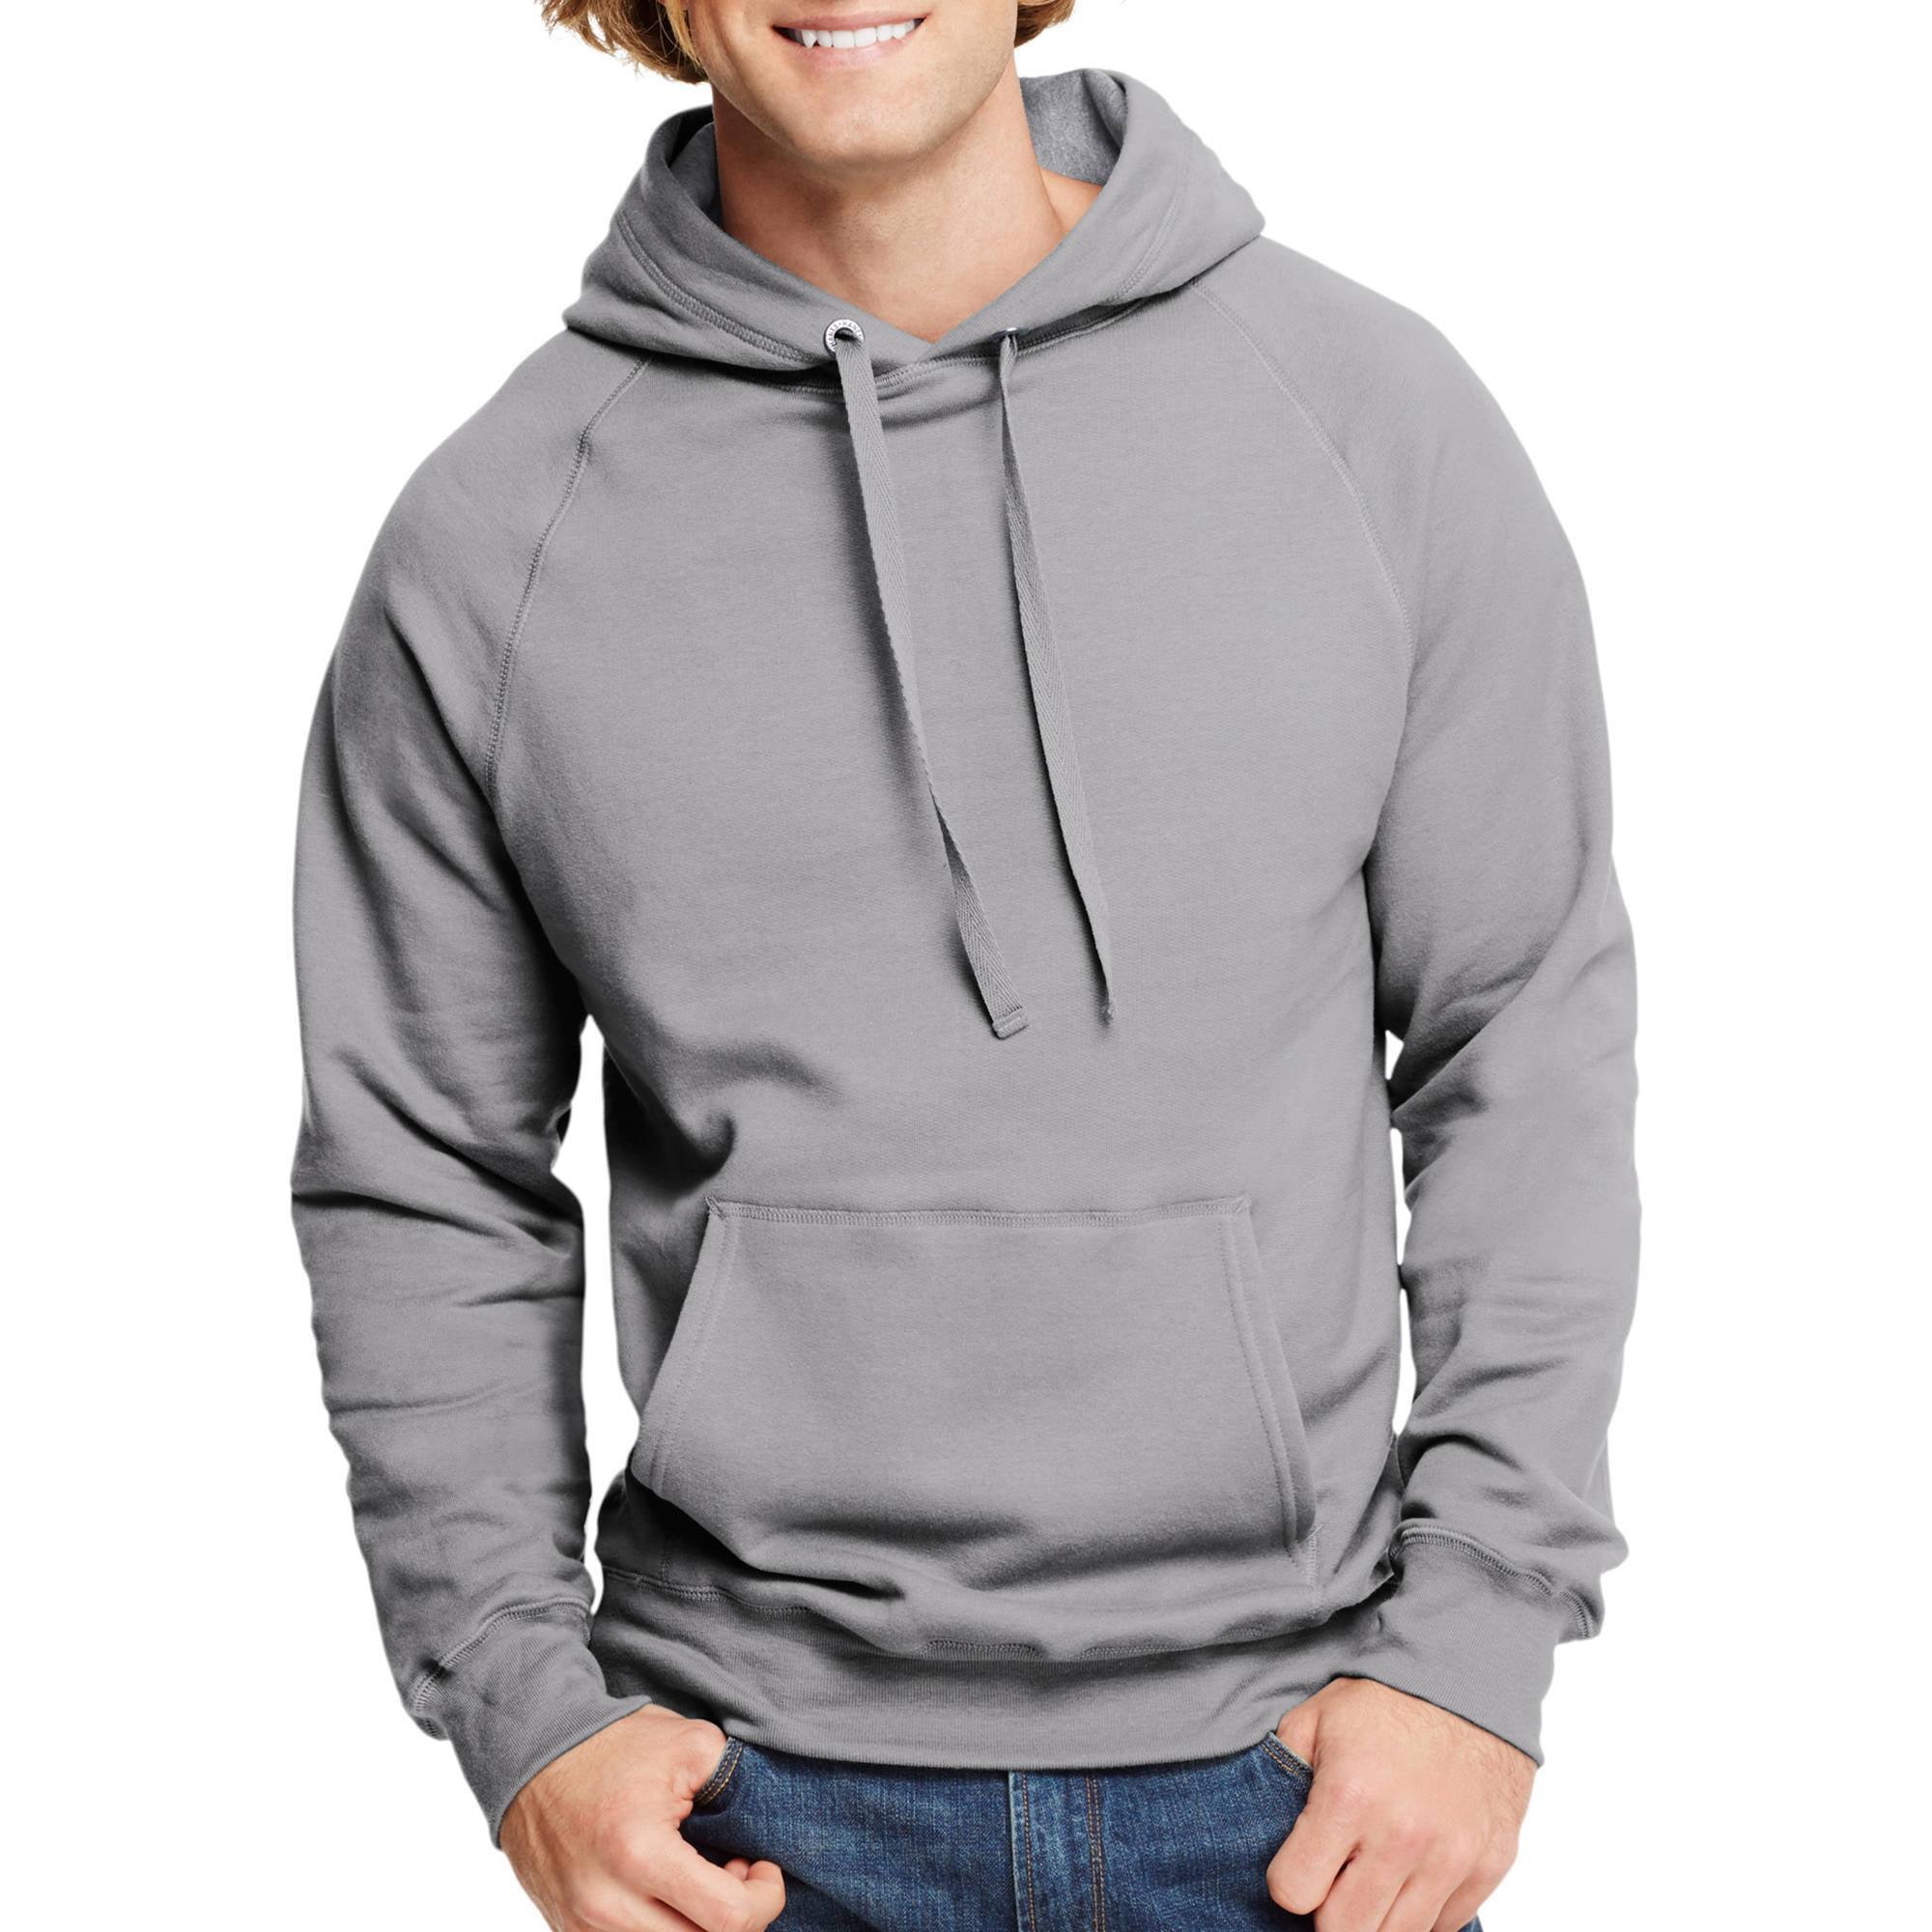 Hanes Men's Nano Premium Soft Lightweight Fleece Pullover Hood ...